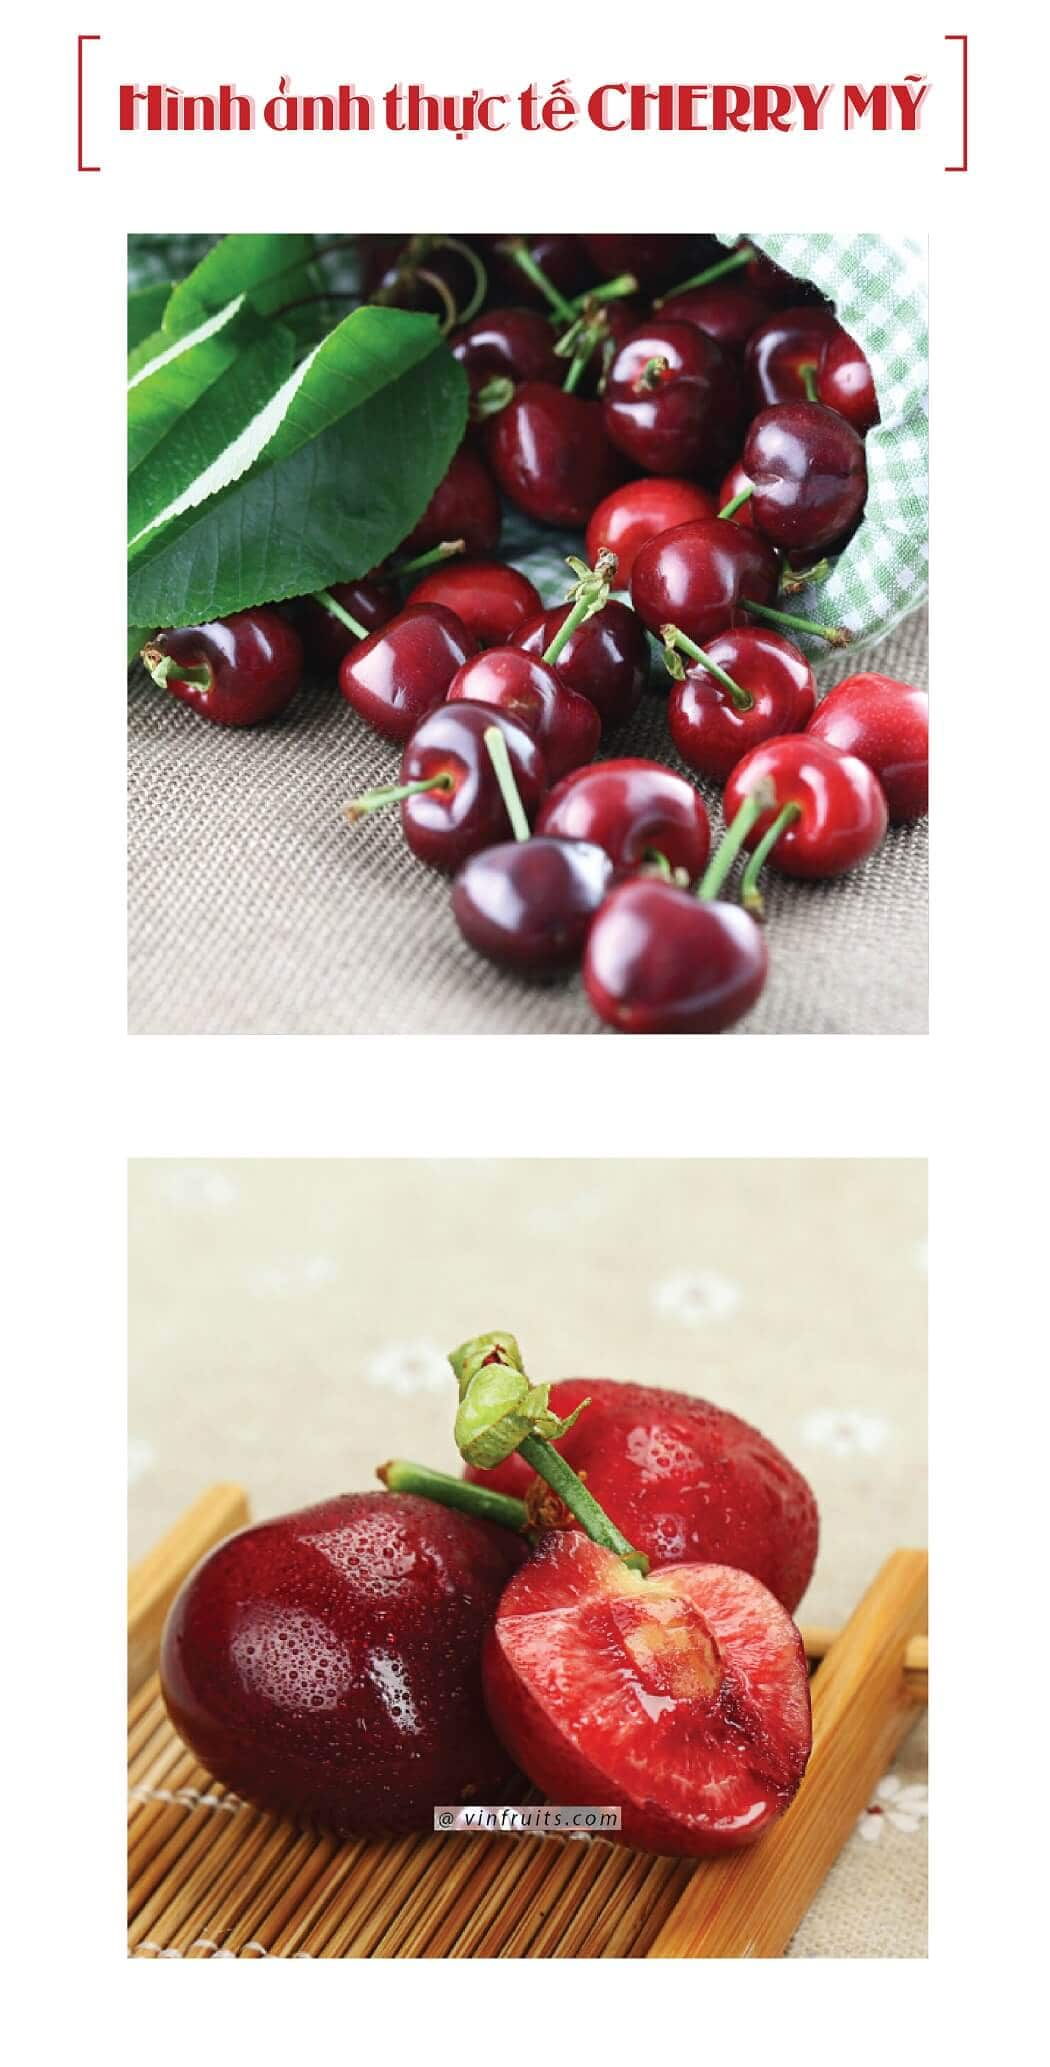 Hinh anh cherry do My - vinfruits.com 2